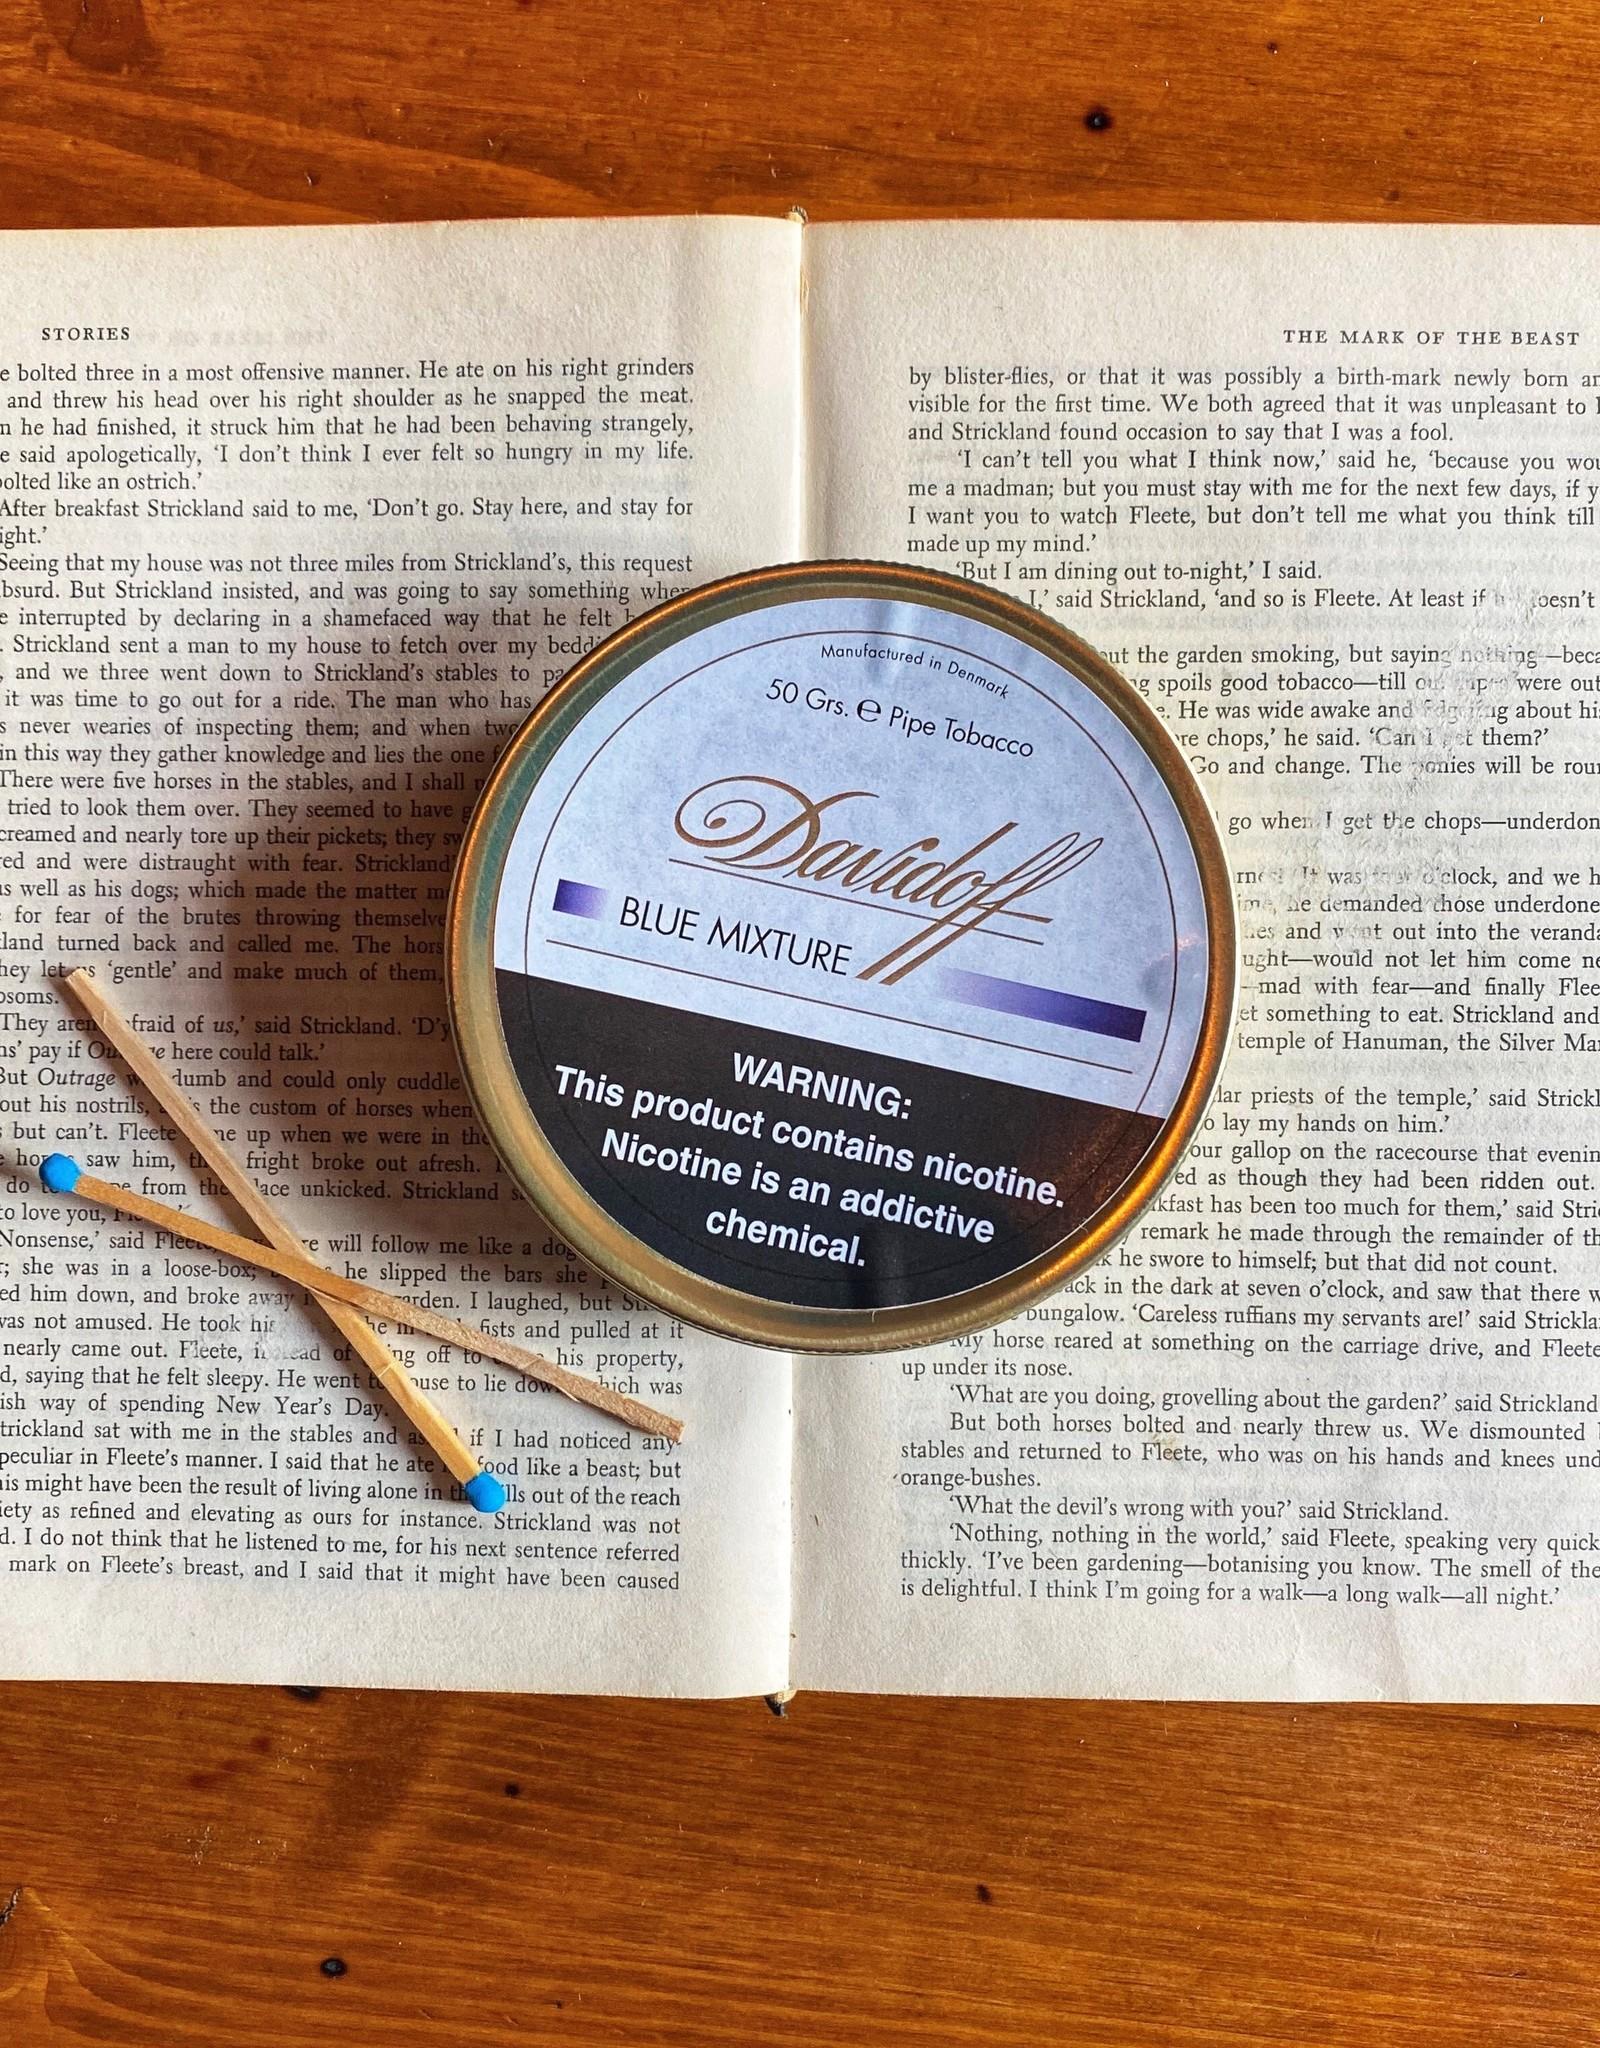 Davidoff Davidoff Blue Mixture Pipe Tobacco 50g Tin